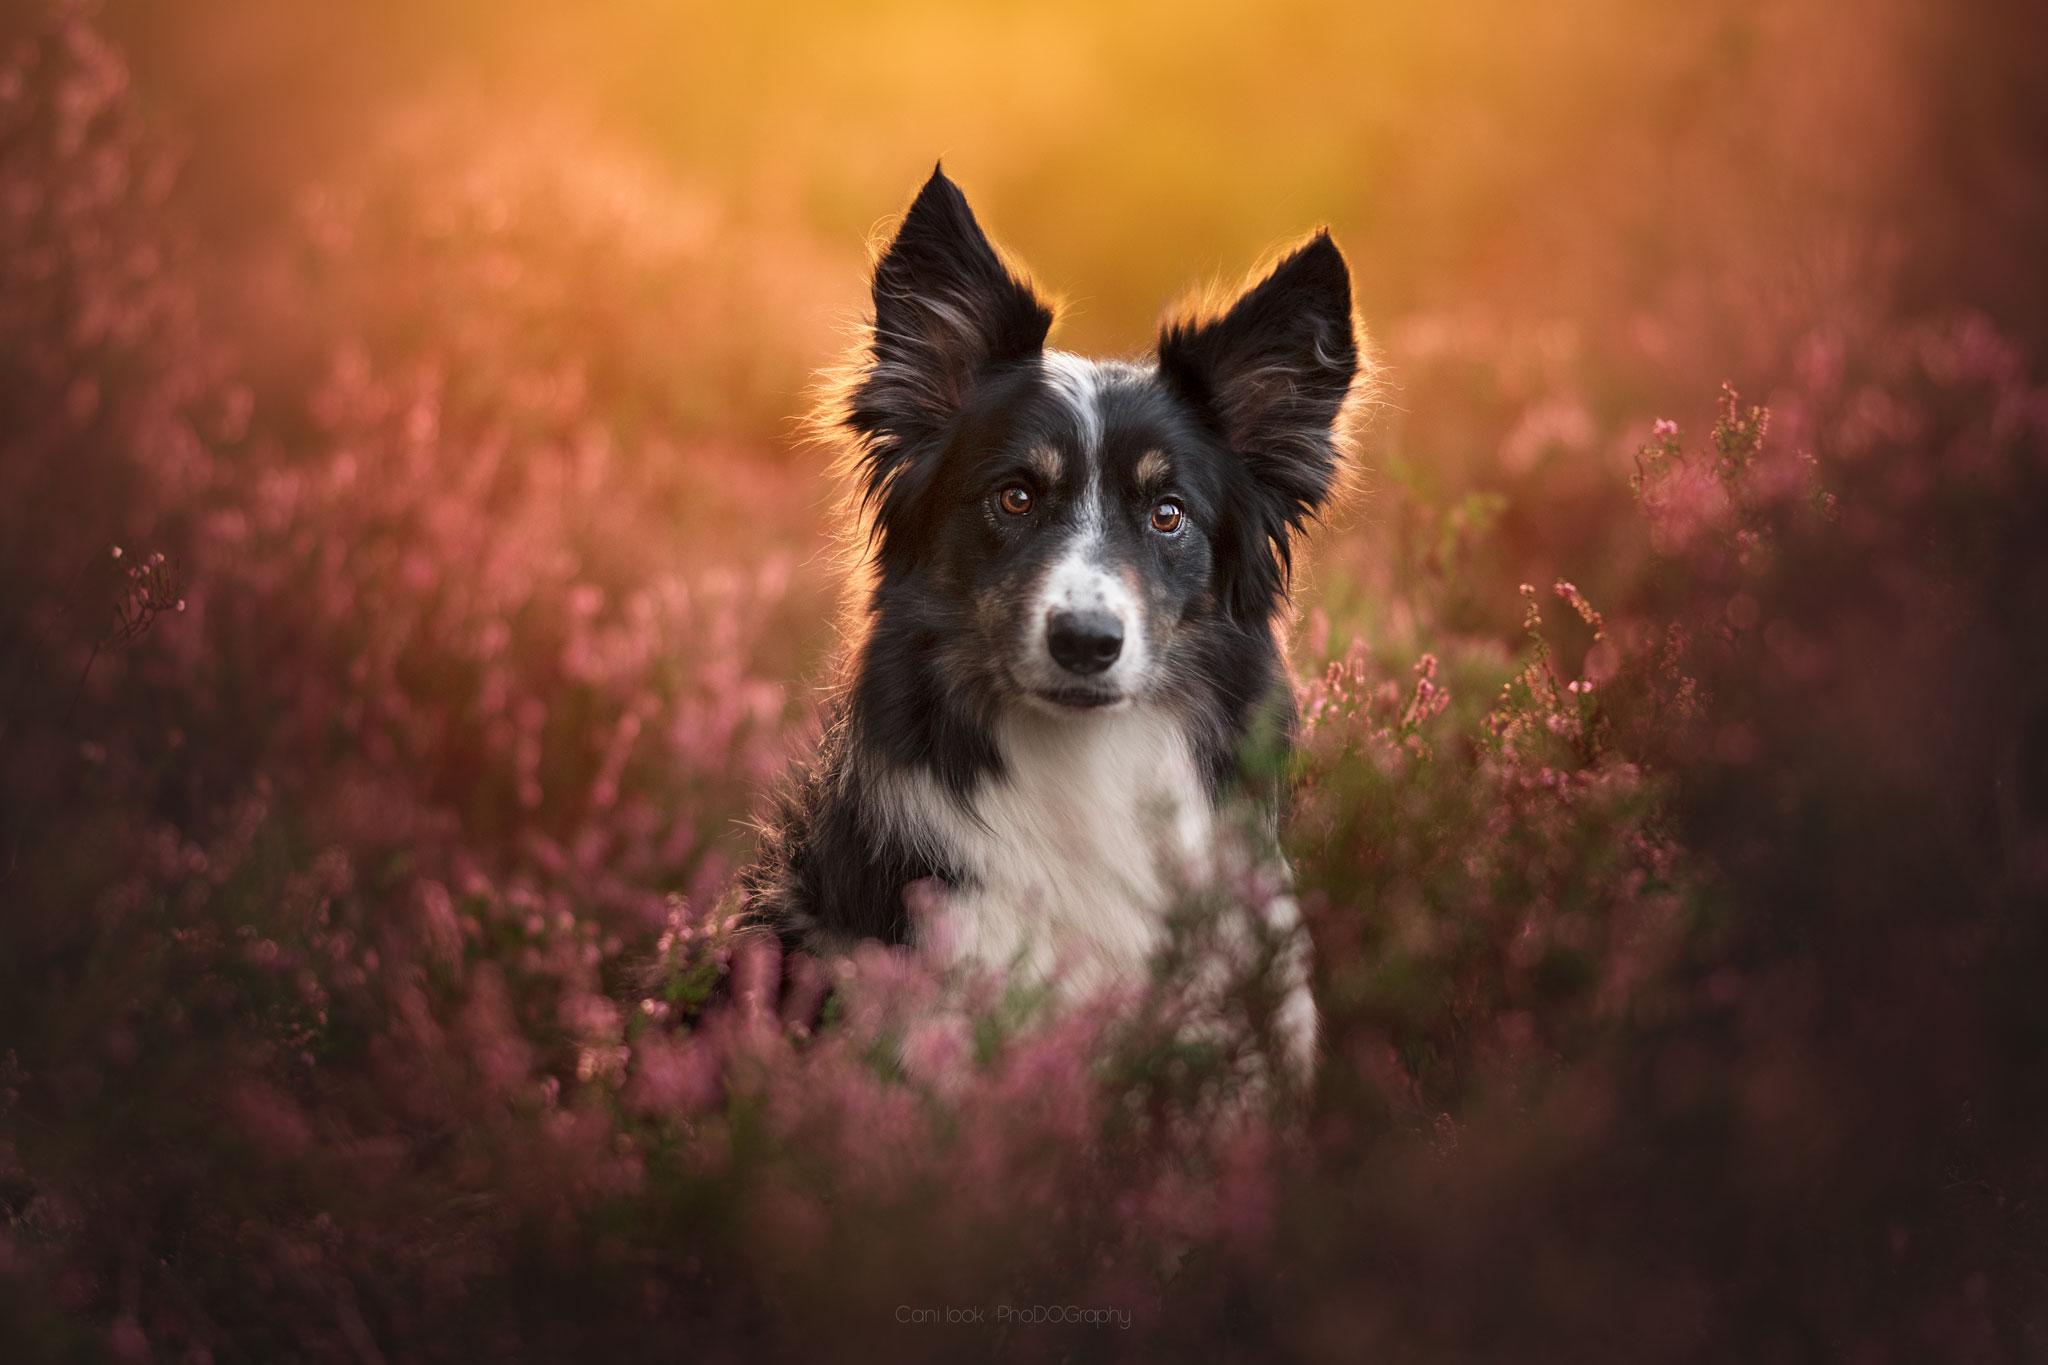 Border collie bruyeres Chien photographe canin portrait cani look